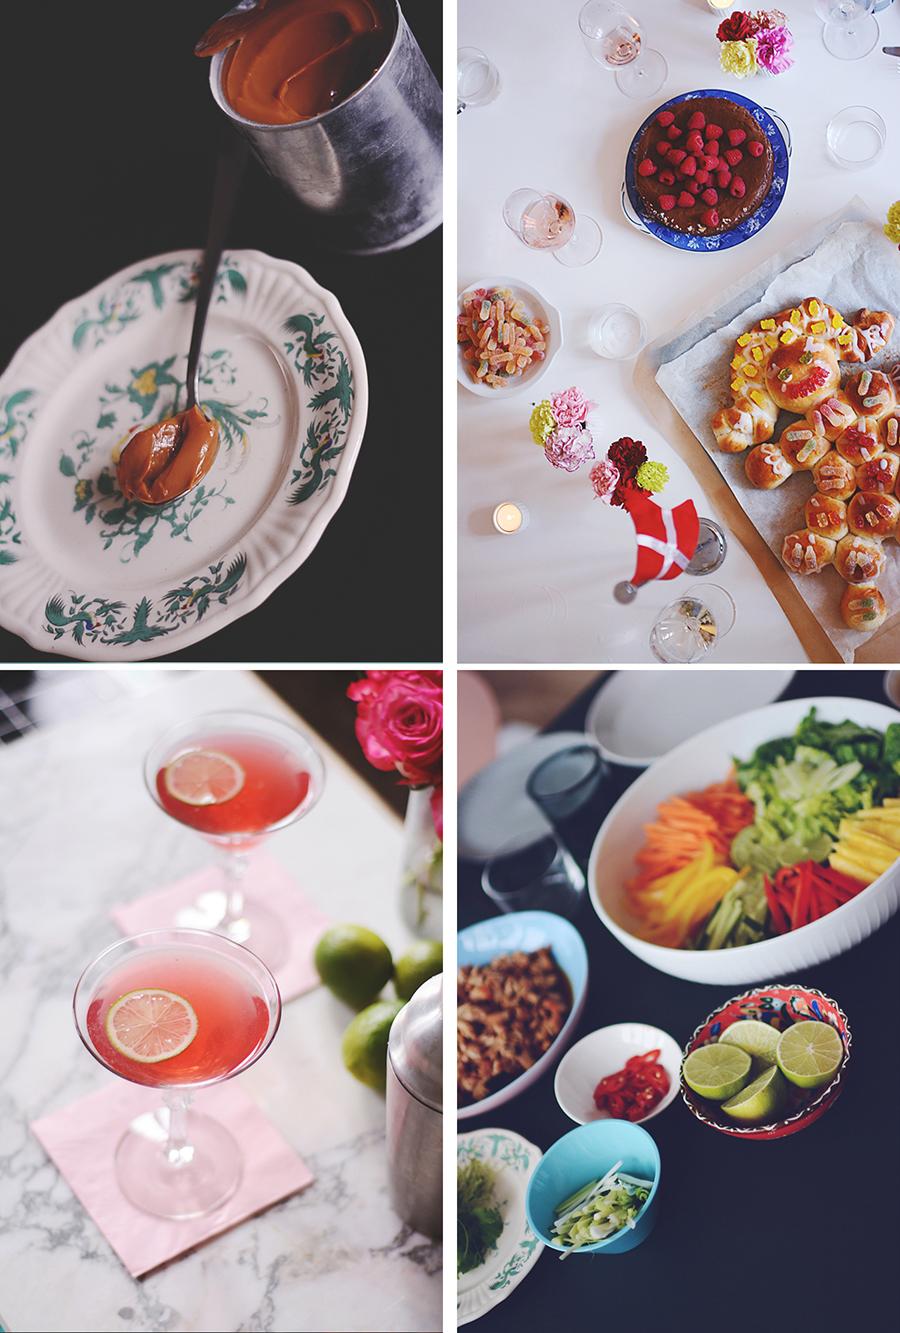 karamelcreme kagekone cosmopolitan friske vietnamesiske forårsruller